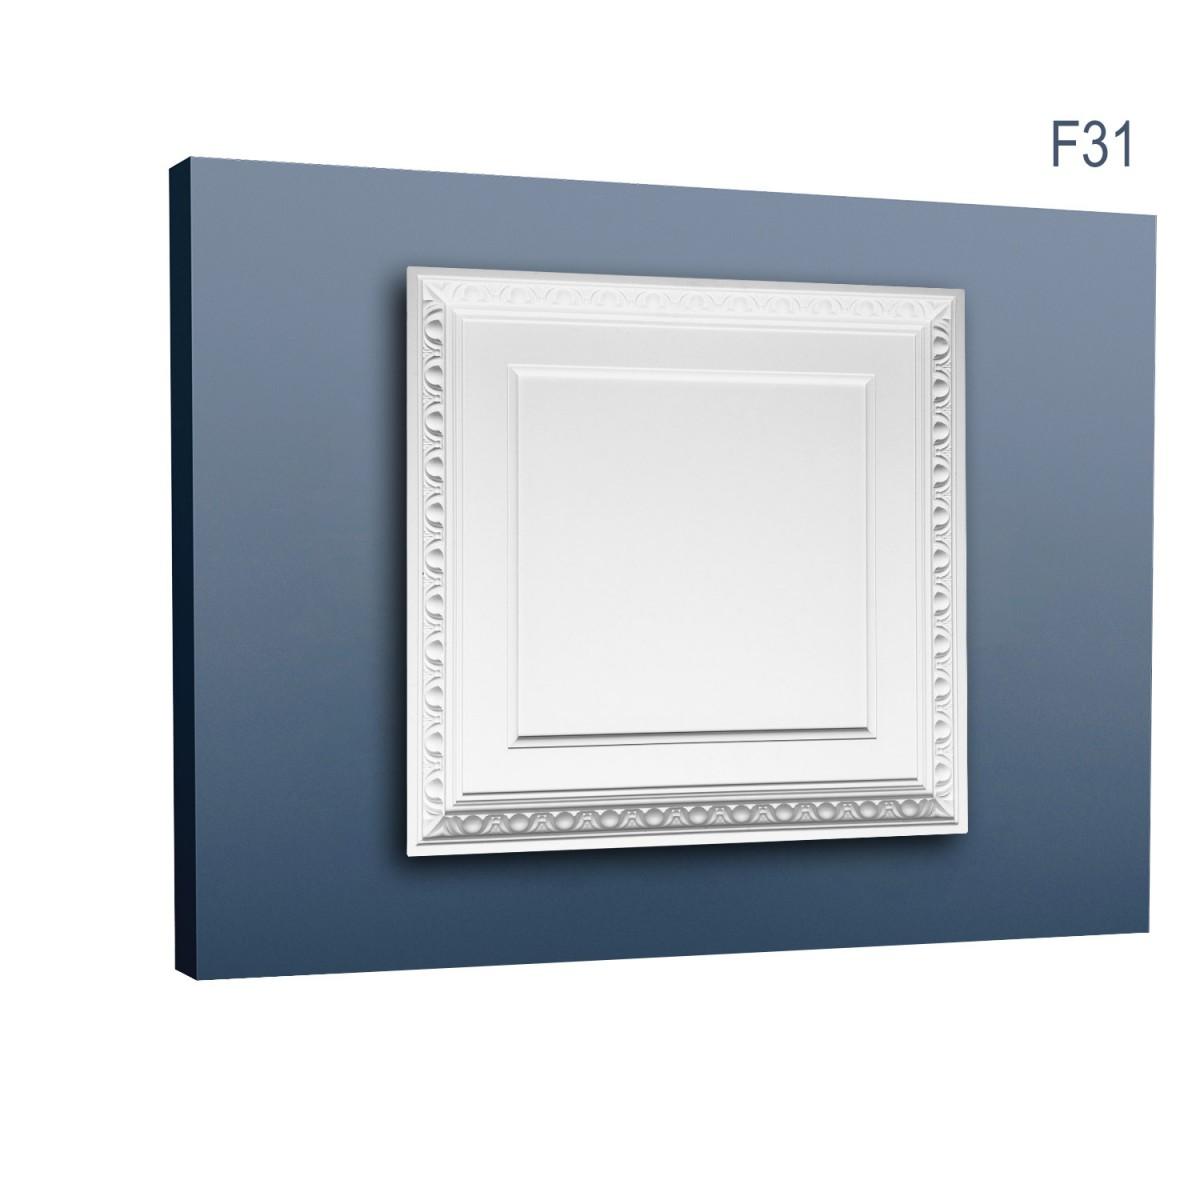 Ornament Tavan Luxxus F31, Dimensiuni: 59.5 X 59.5 X 6.6 cm, Orac Decor